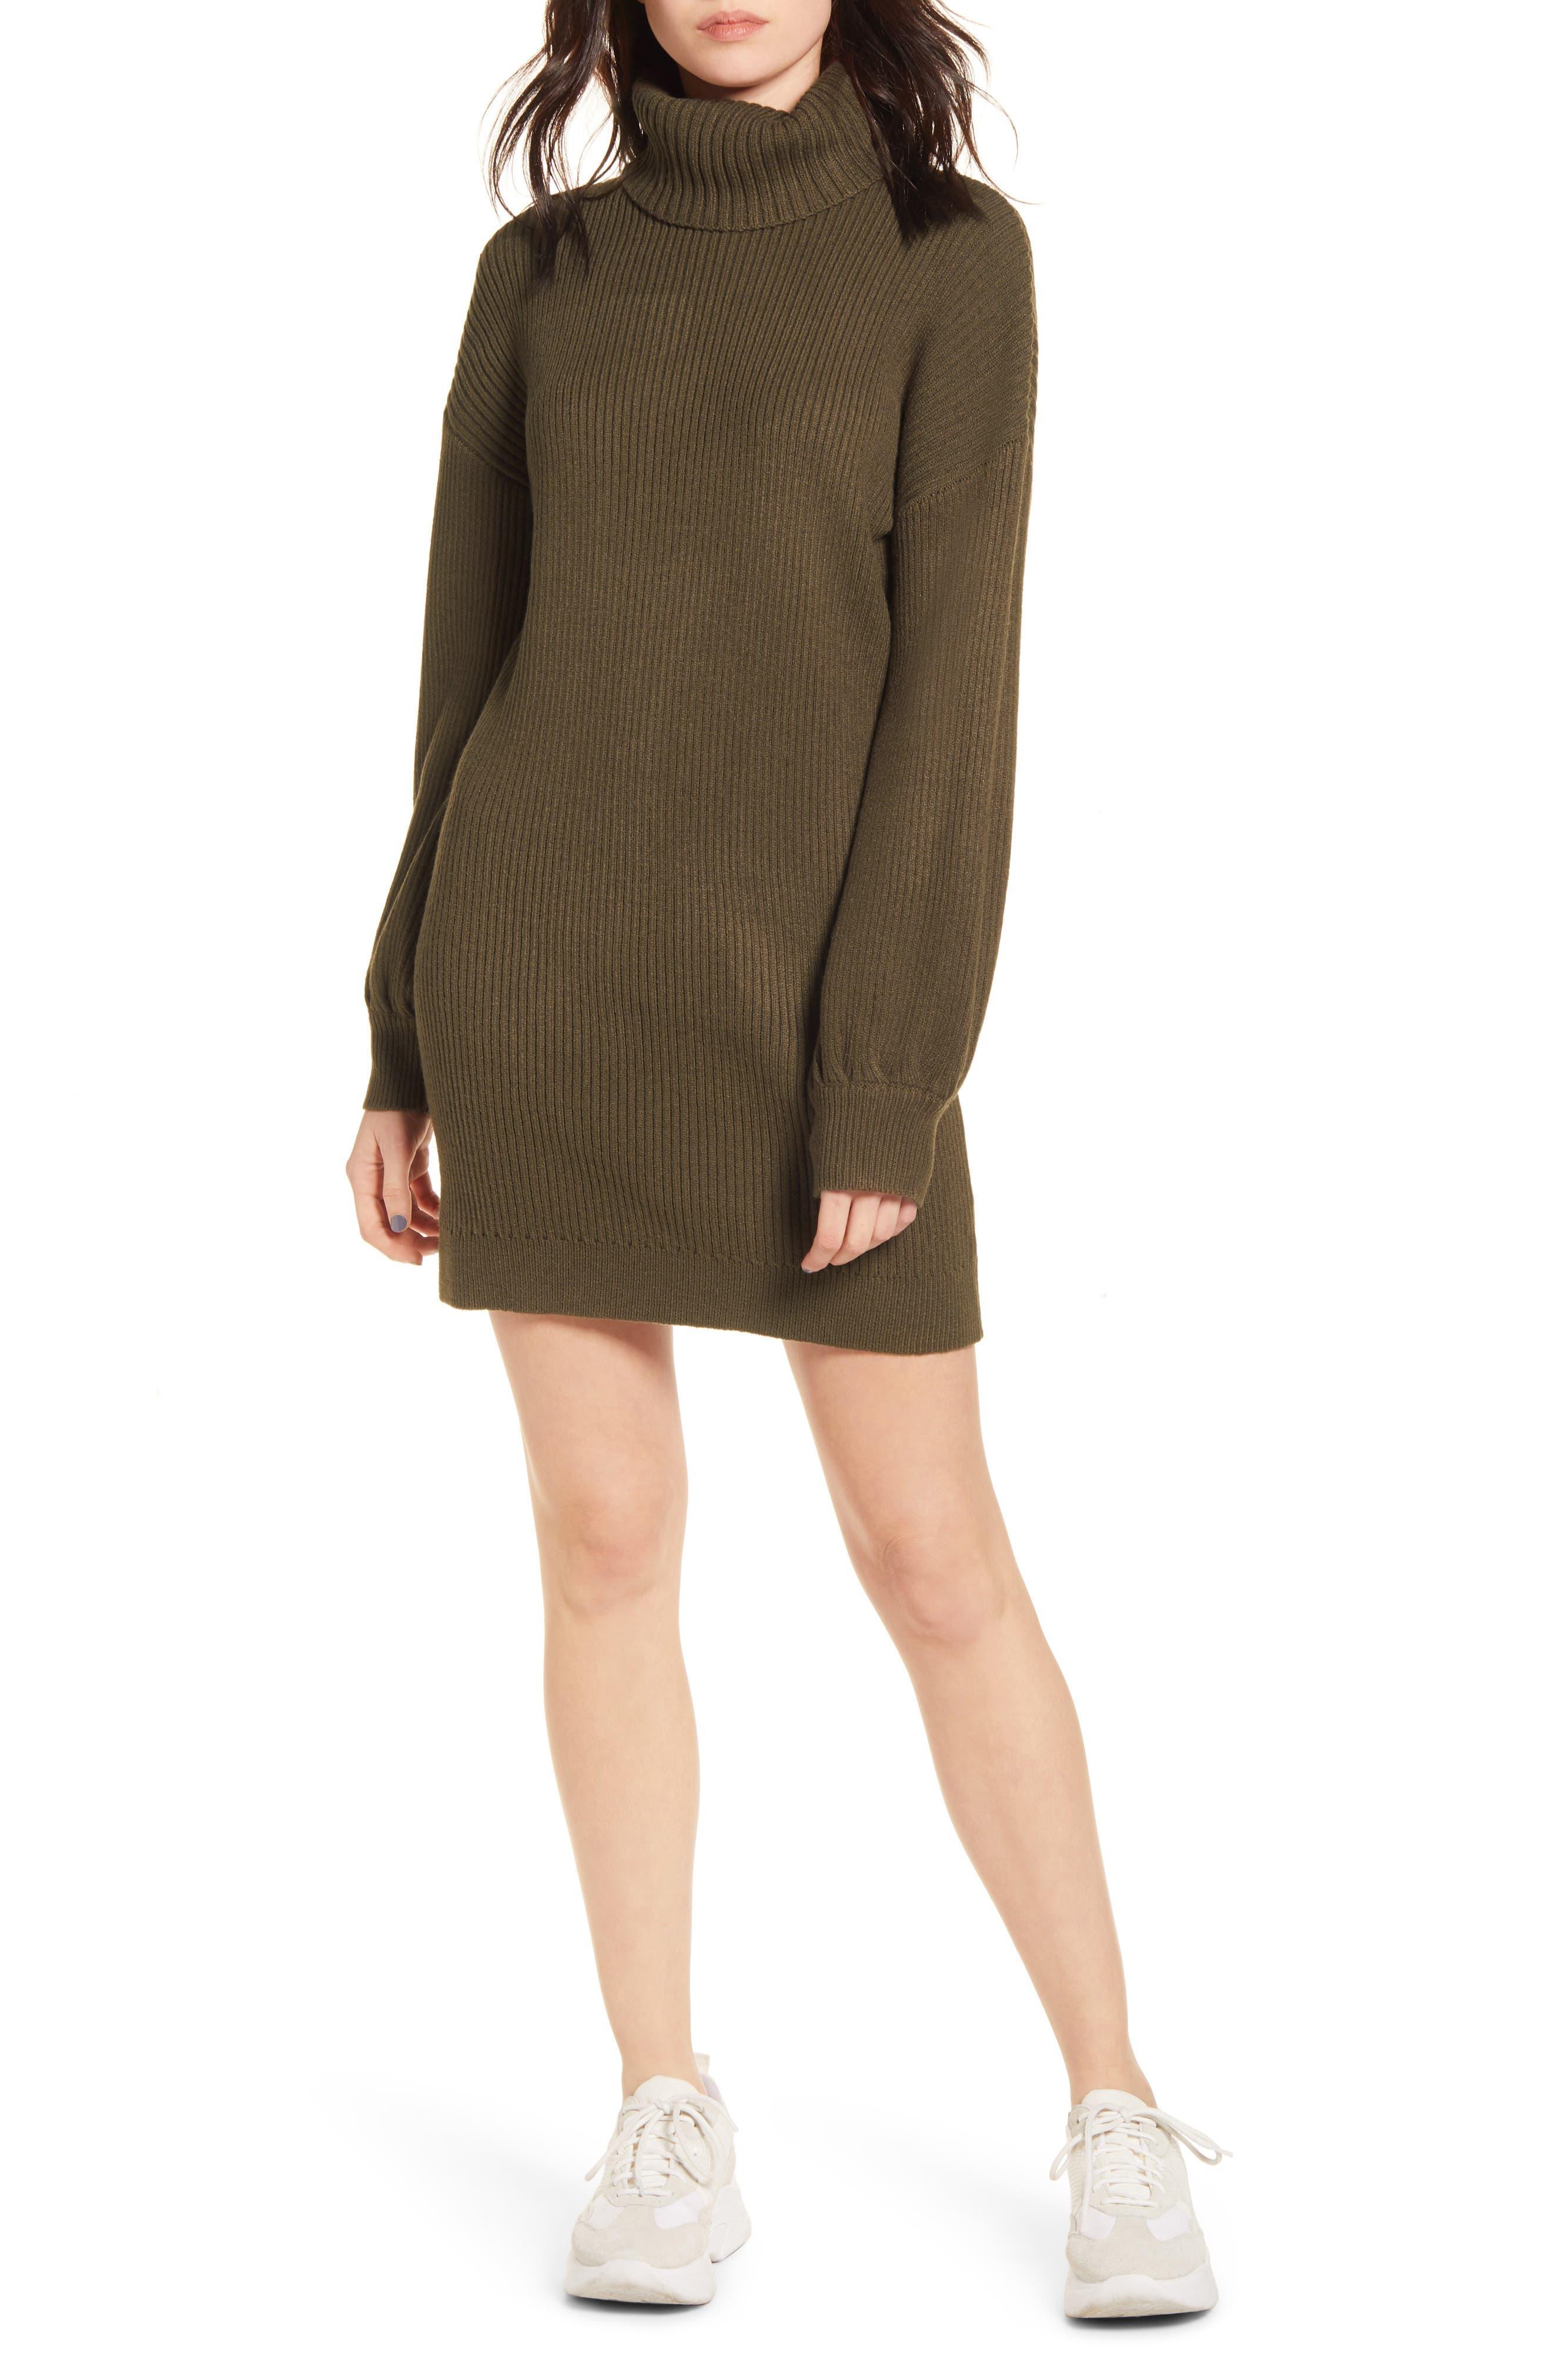 All in Favor Turtleneck Sweater Dress